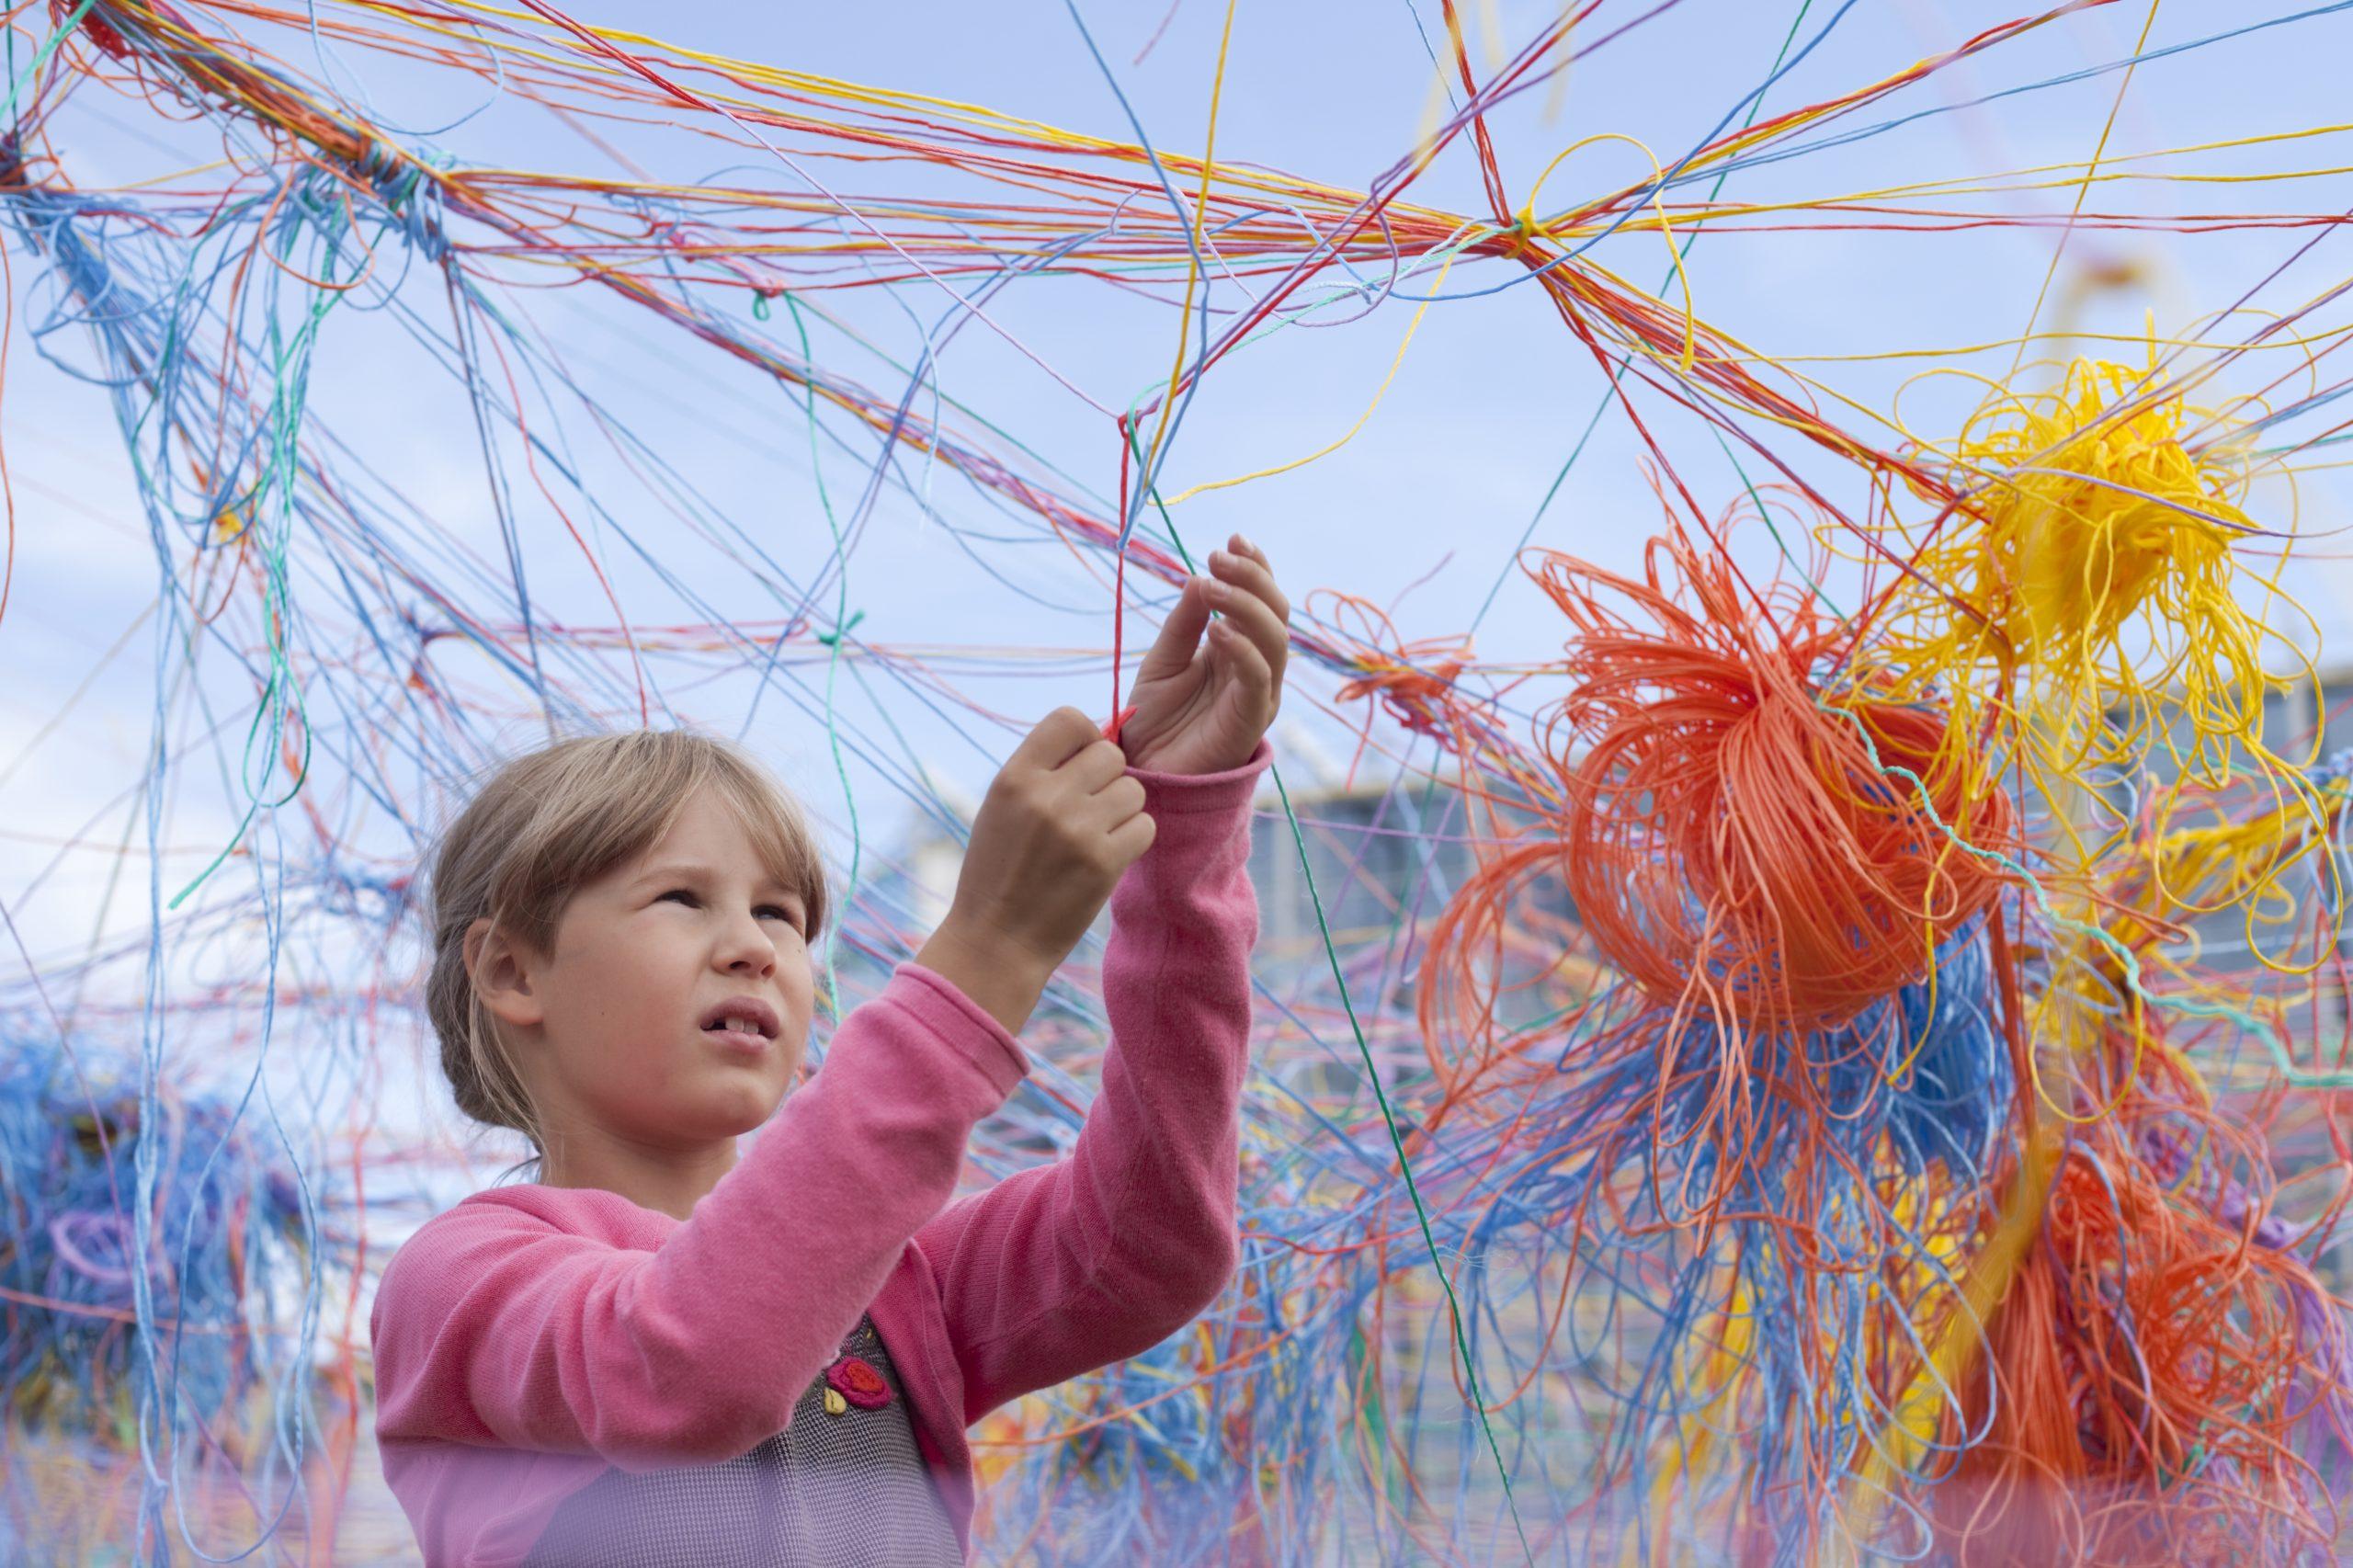 Collective Strings instalacija stvarat će se dan po dan, uz pomoć kilometara šarenih niti